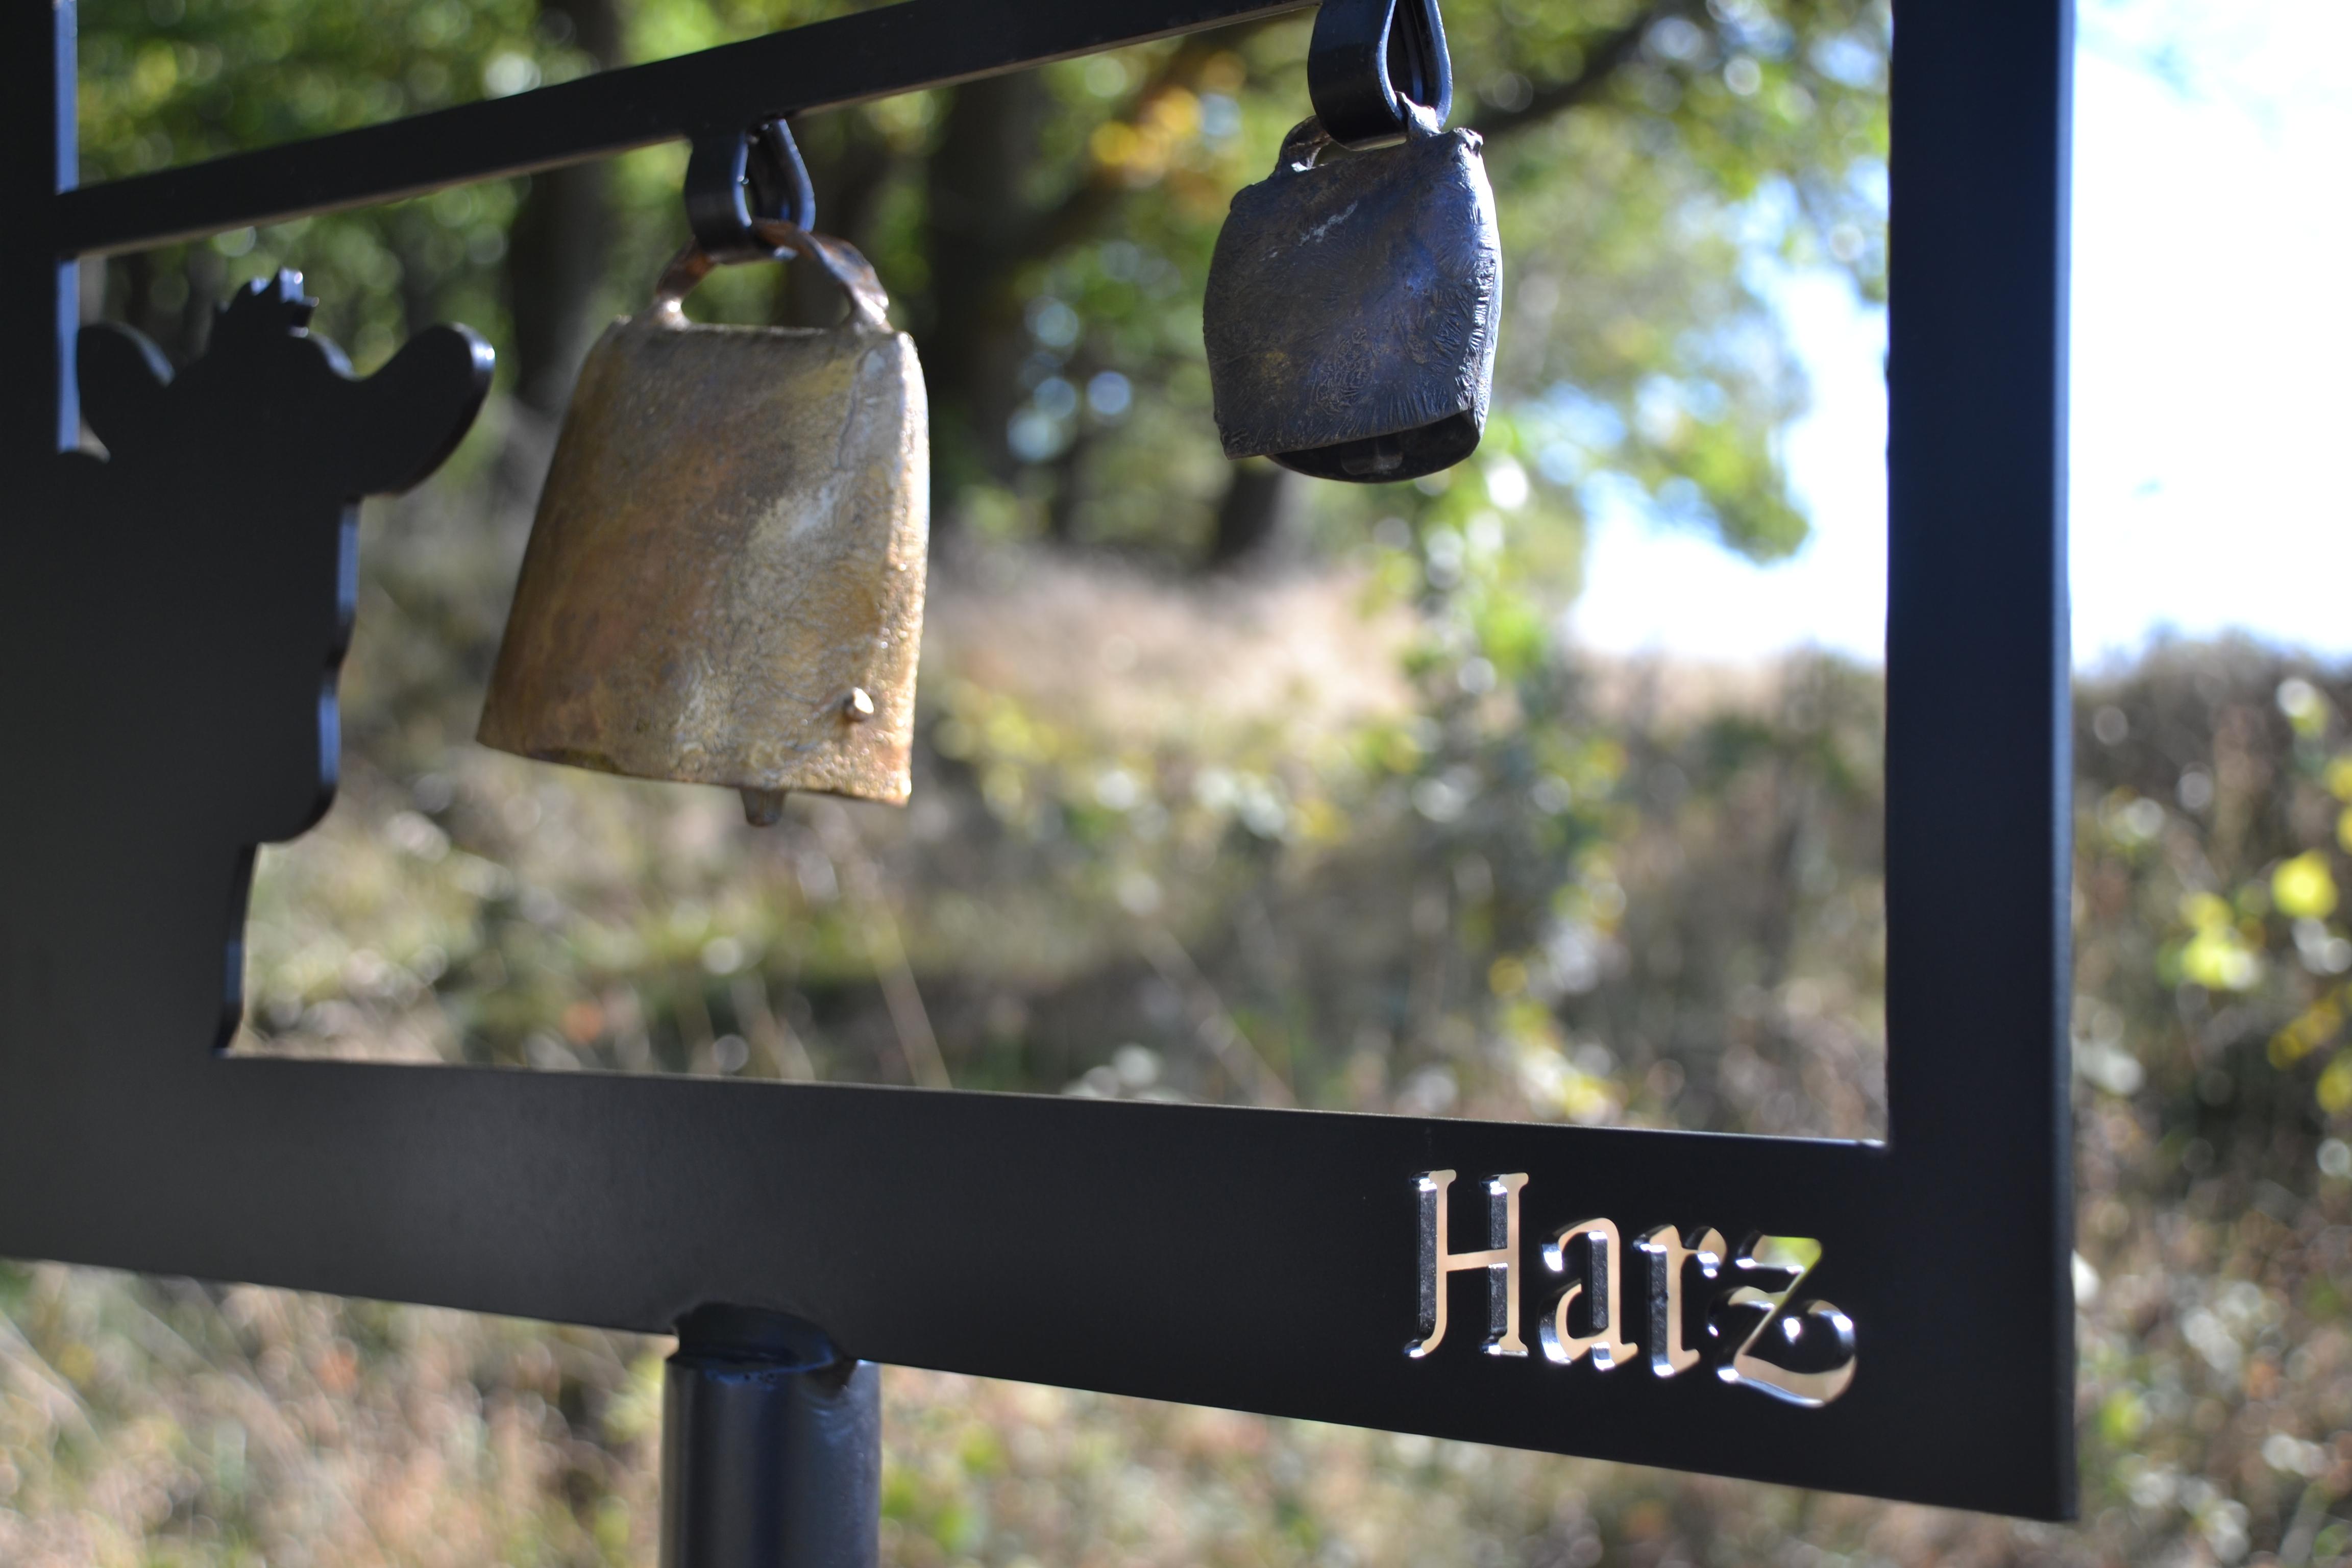 Harzer-Hexen-Stieg, Erlebnisinsel Hasselfelde